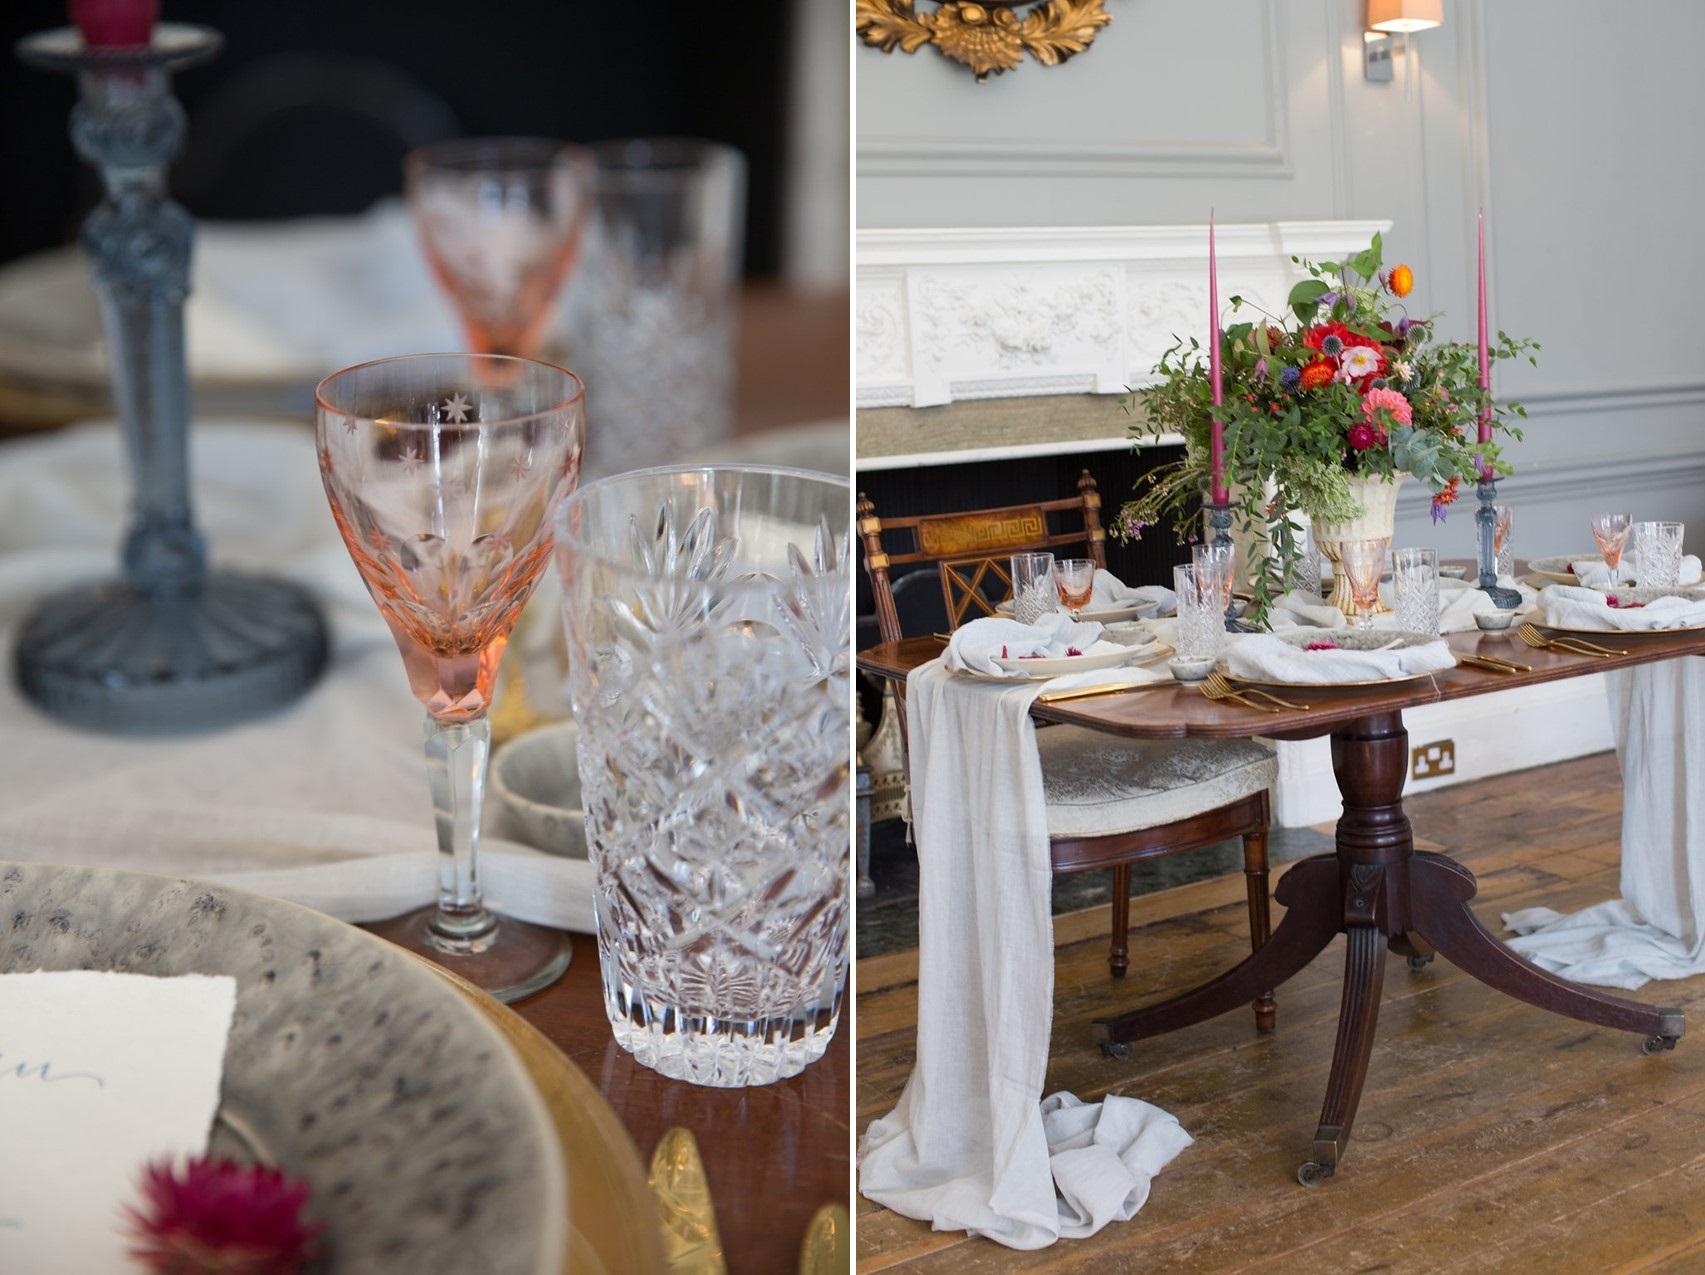 English Manor Wedding Table